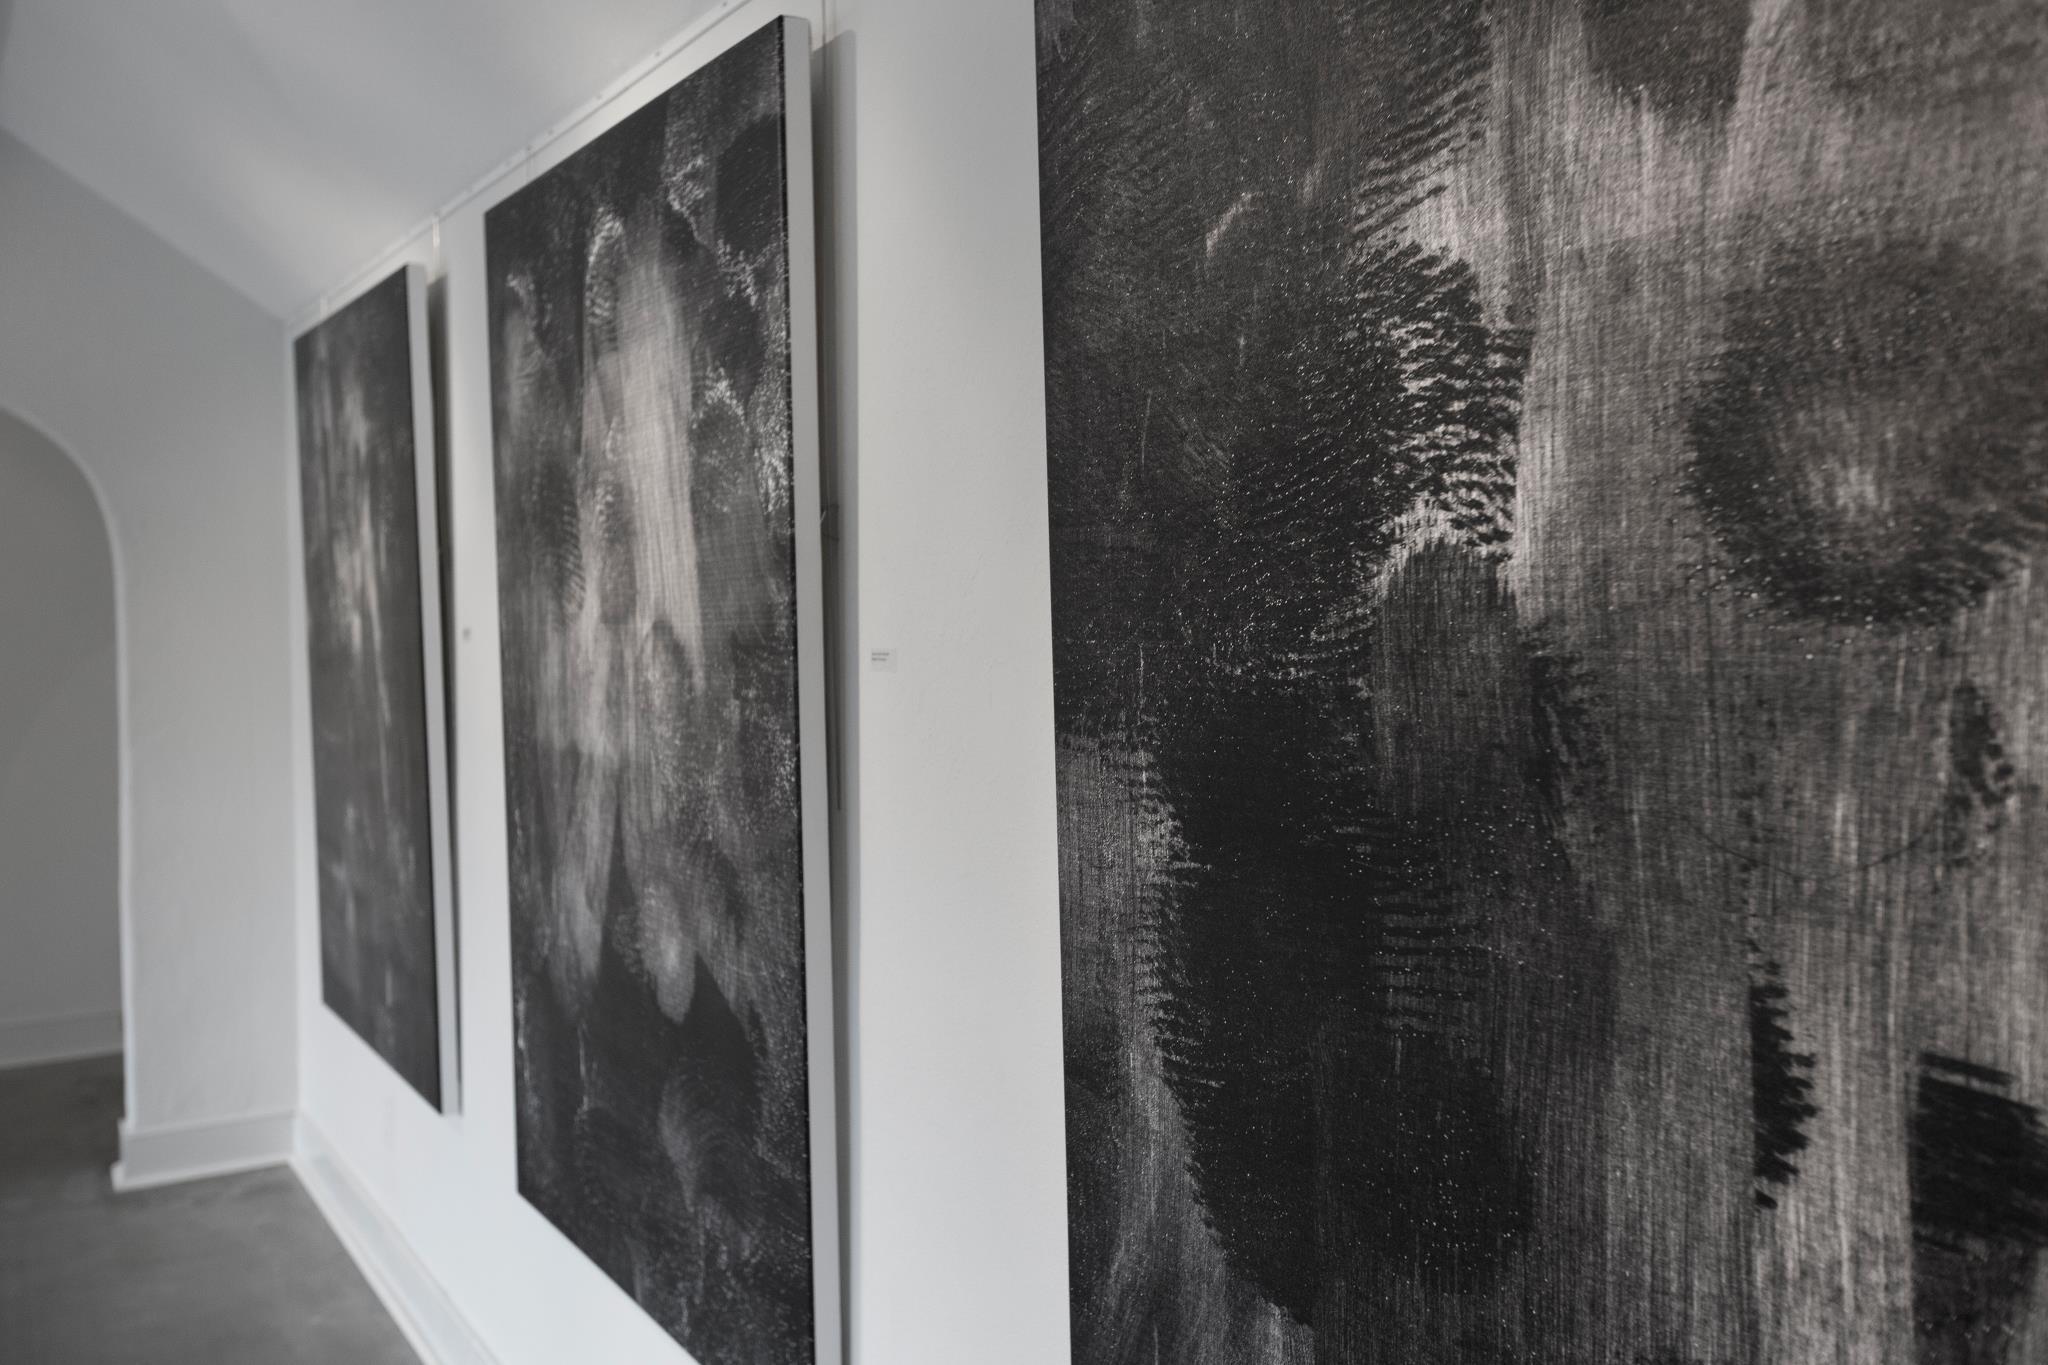 Exhibit view: Start Gallery, 2013